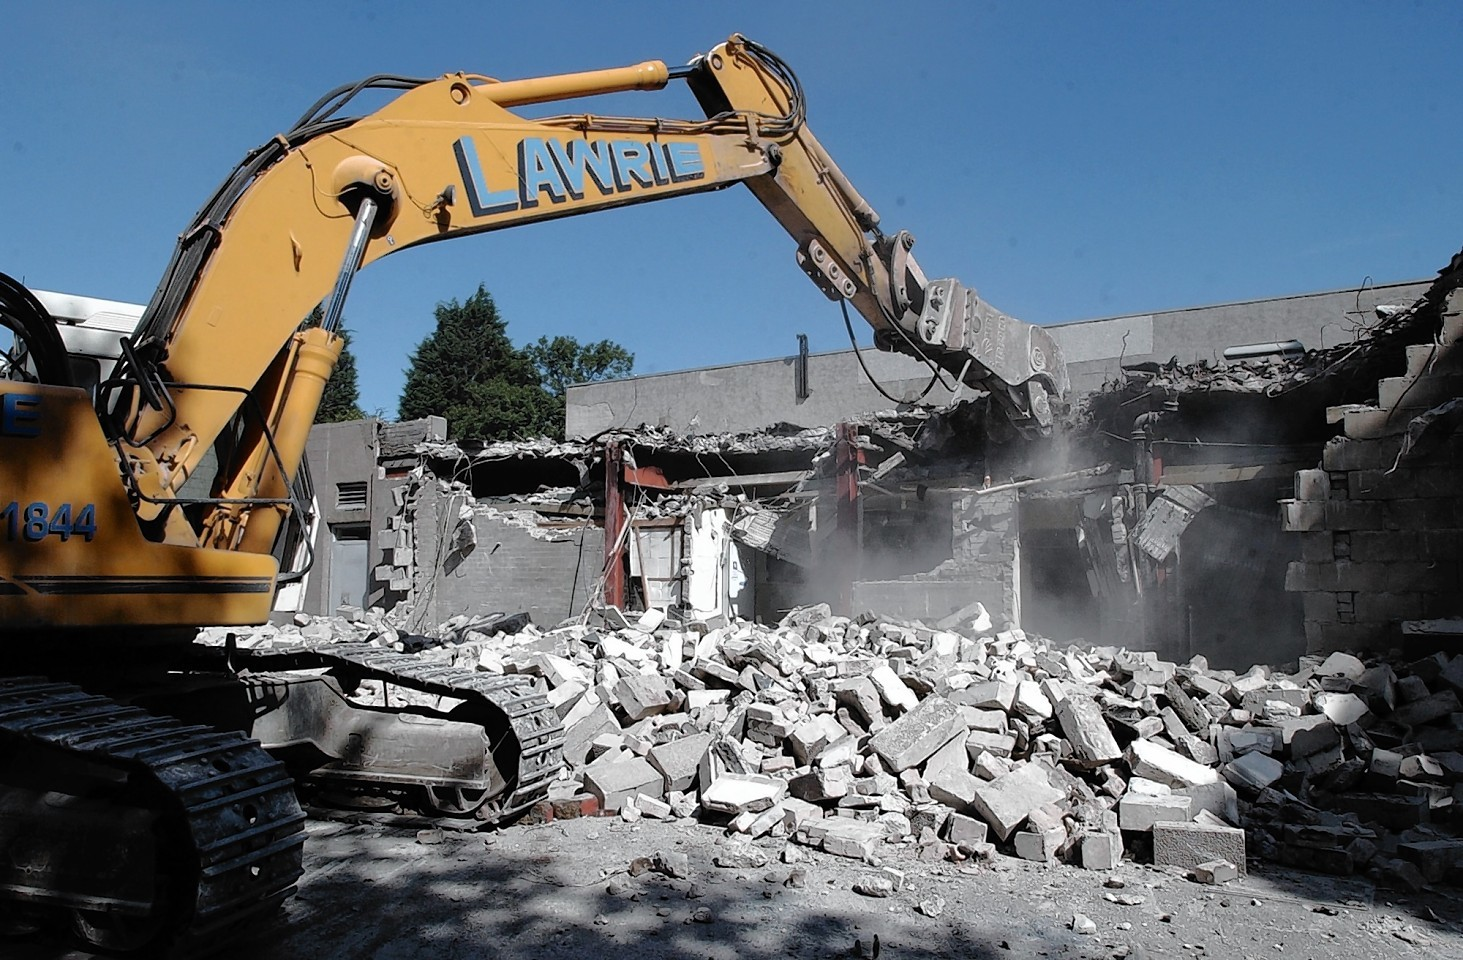 Dunbar Halls being demolished